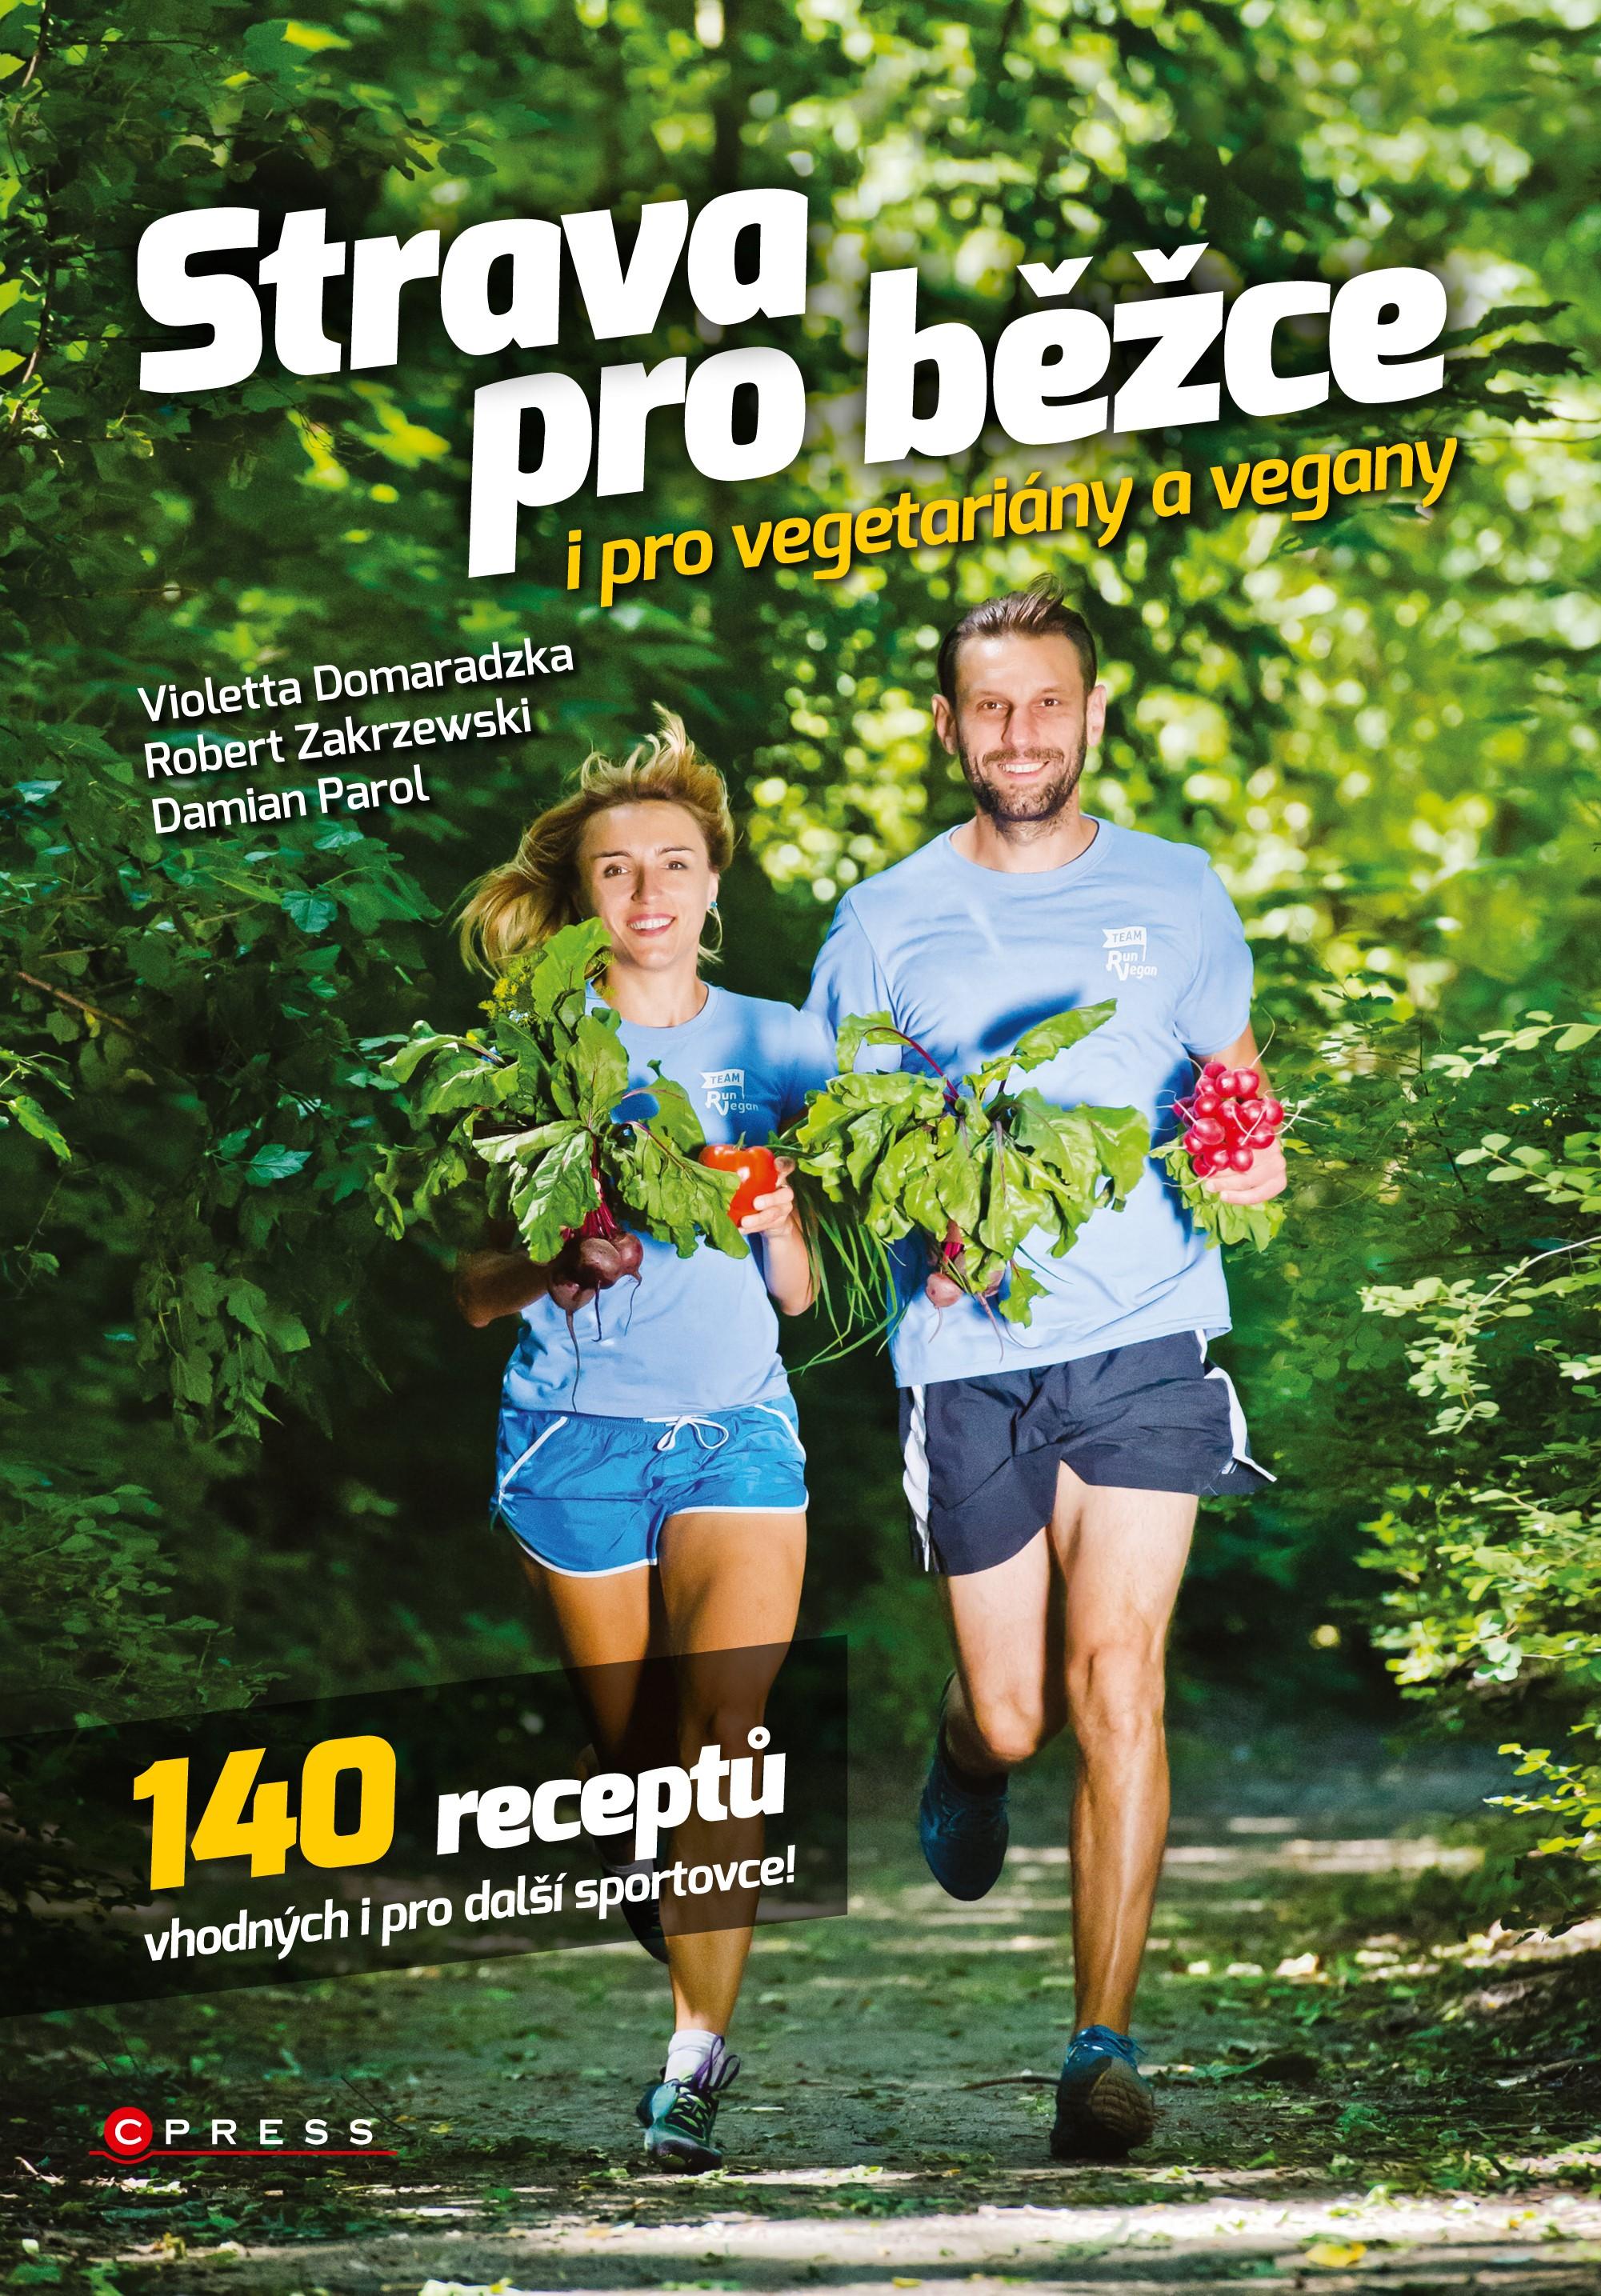 Strava pro běžce - i pro vegetariány a vegany | Damian Parol, Violetta Domaradzka , Robert Zakrzewski